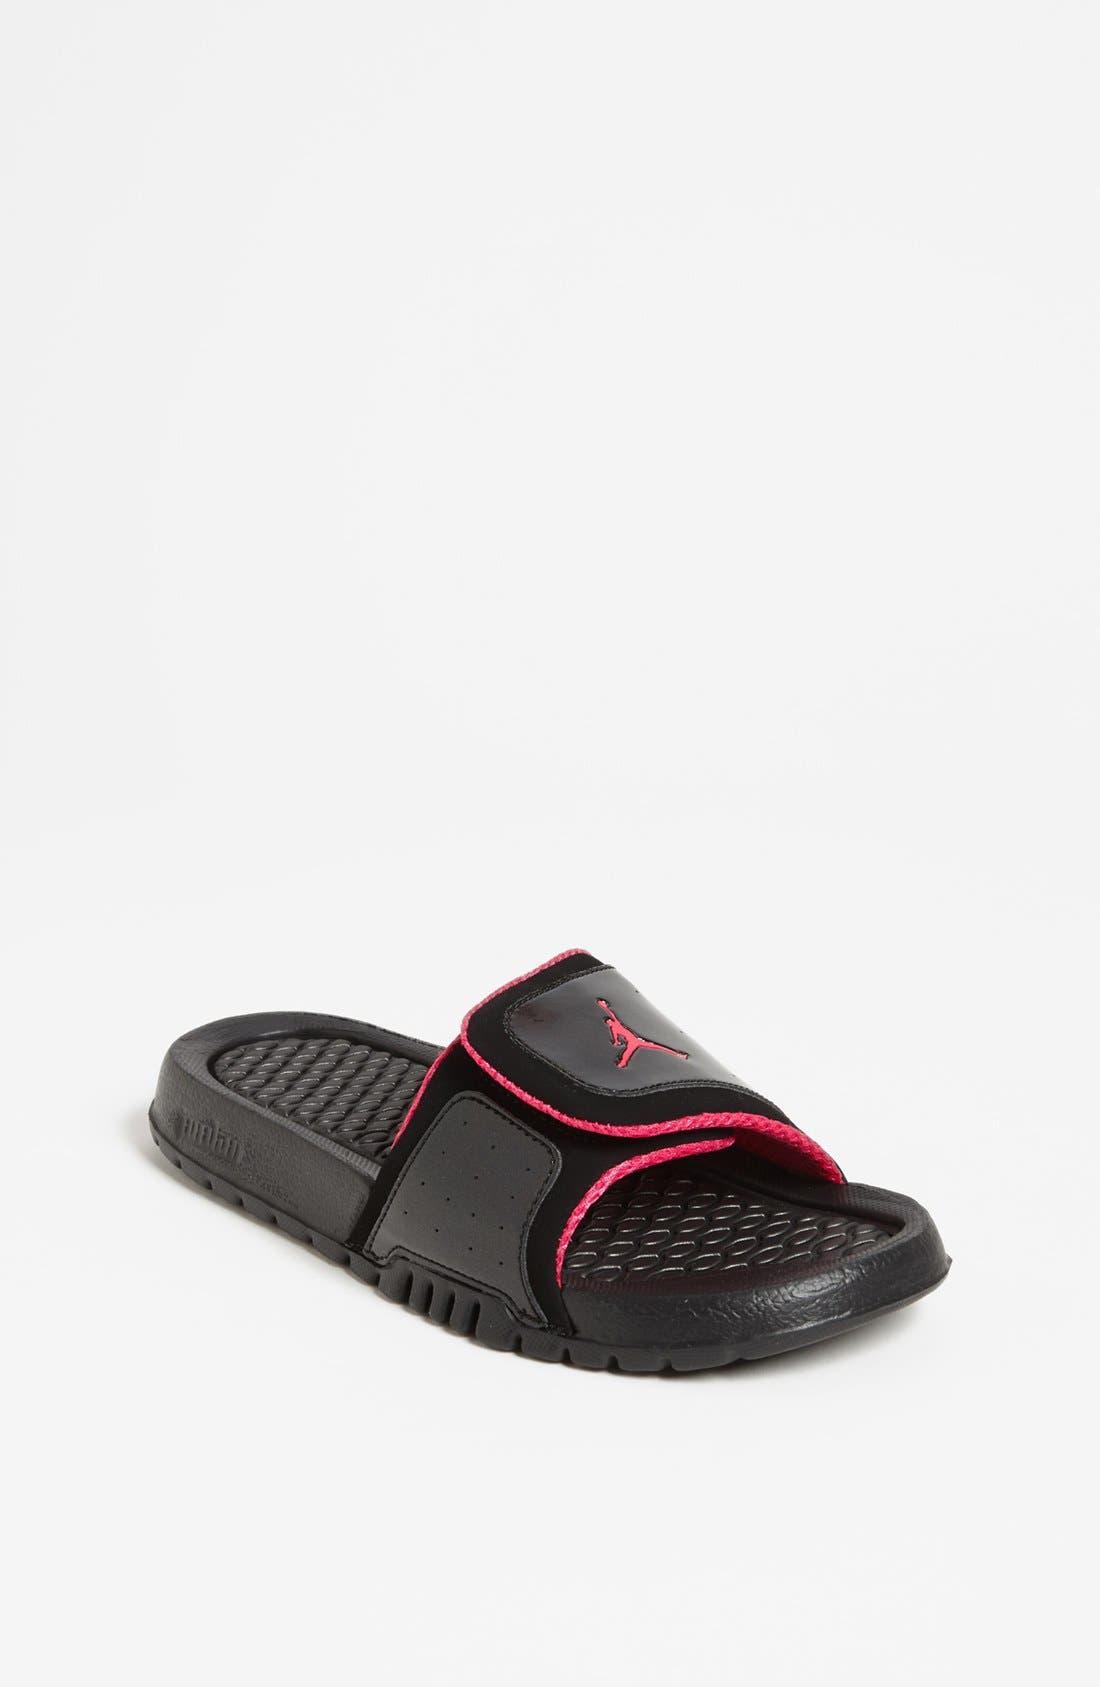 Alternate Image 1 Selected - Nike 'Jordan Hydro II' Sandal (Big Kid)